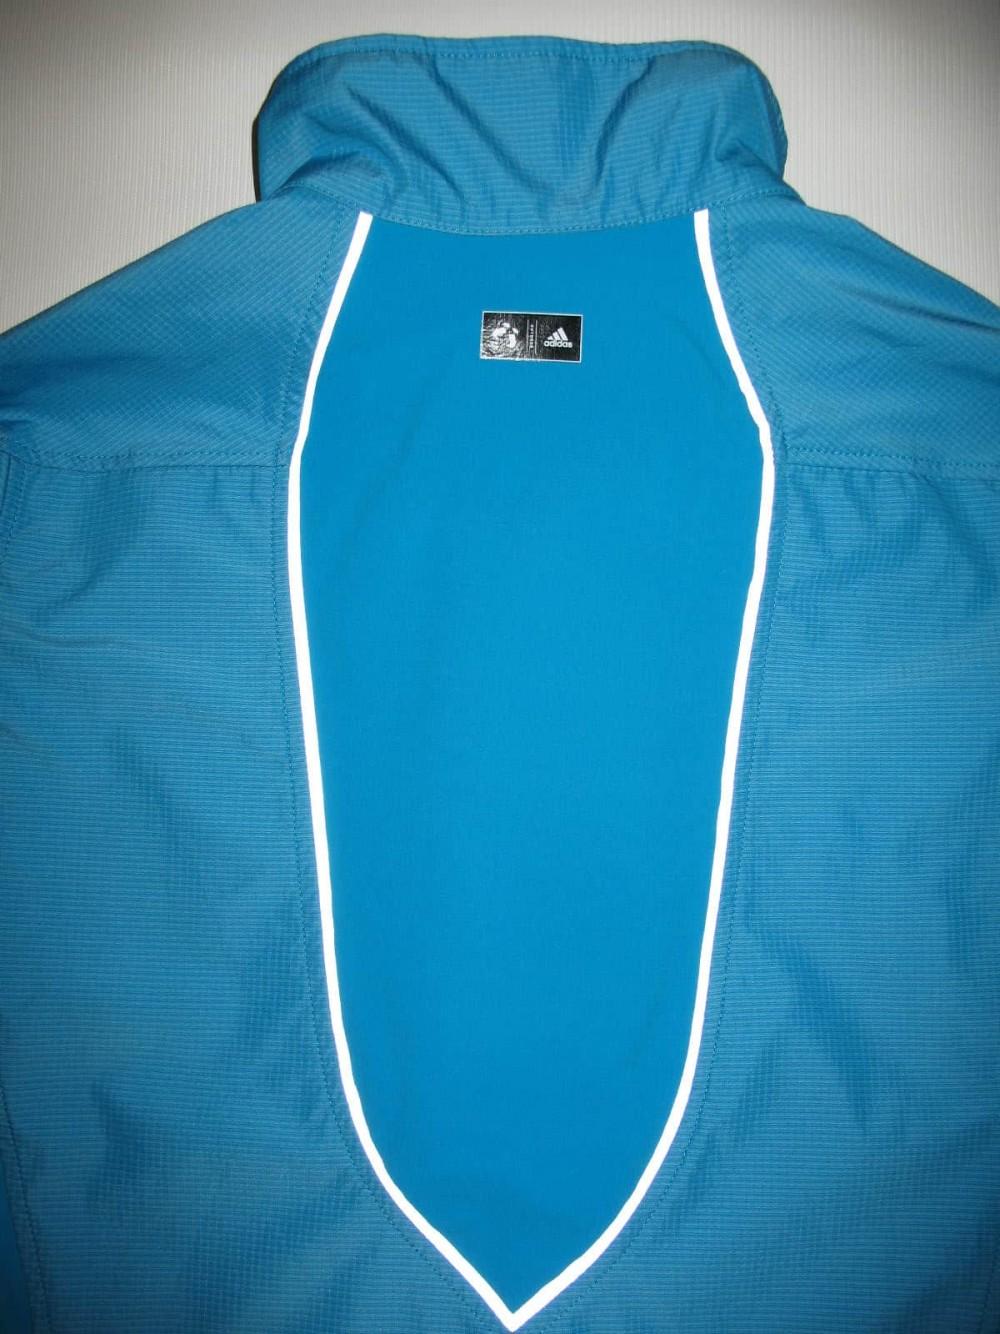 Куртка ADIDAS terrex hybrid windstopper jacket lady (размер 12-L/M) - 8